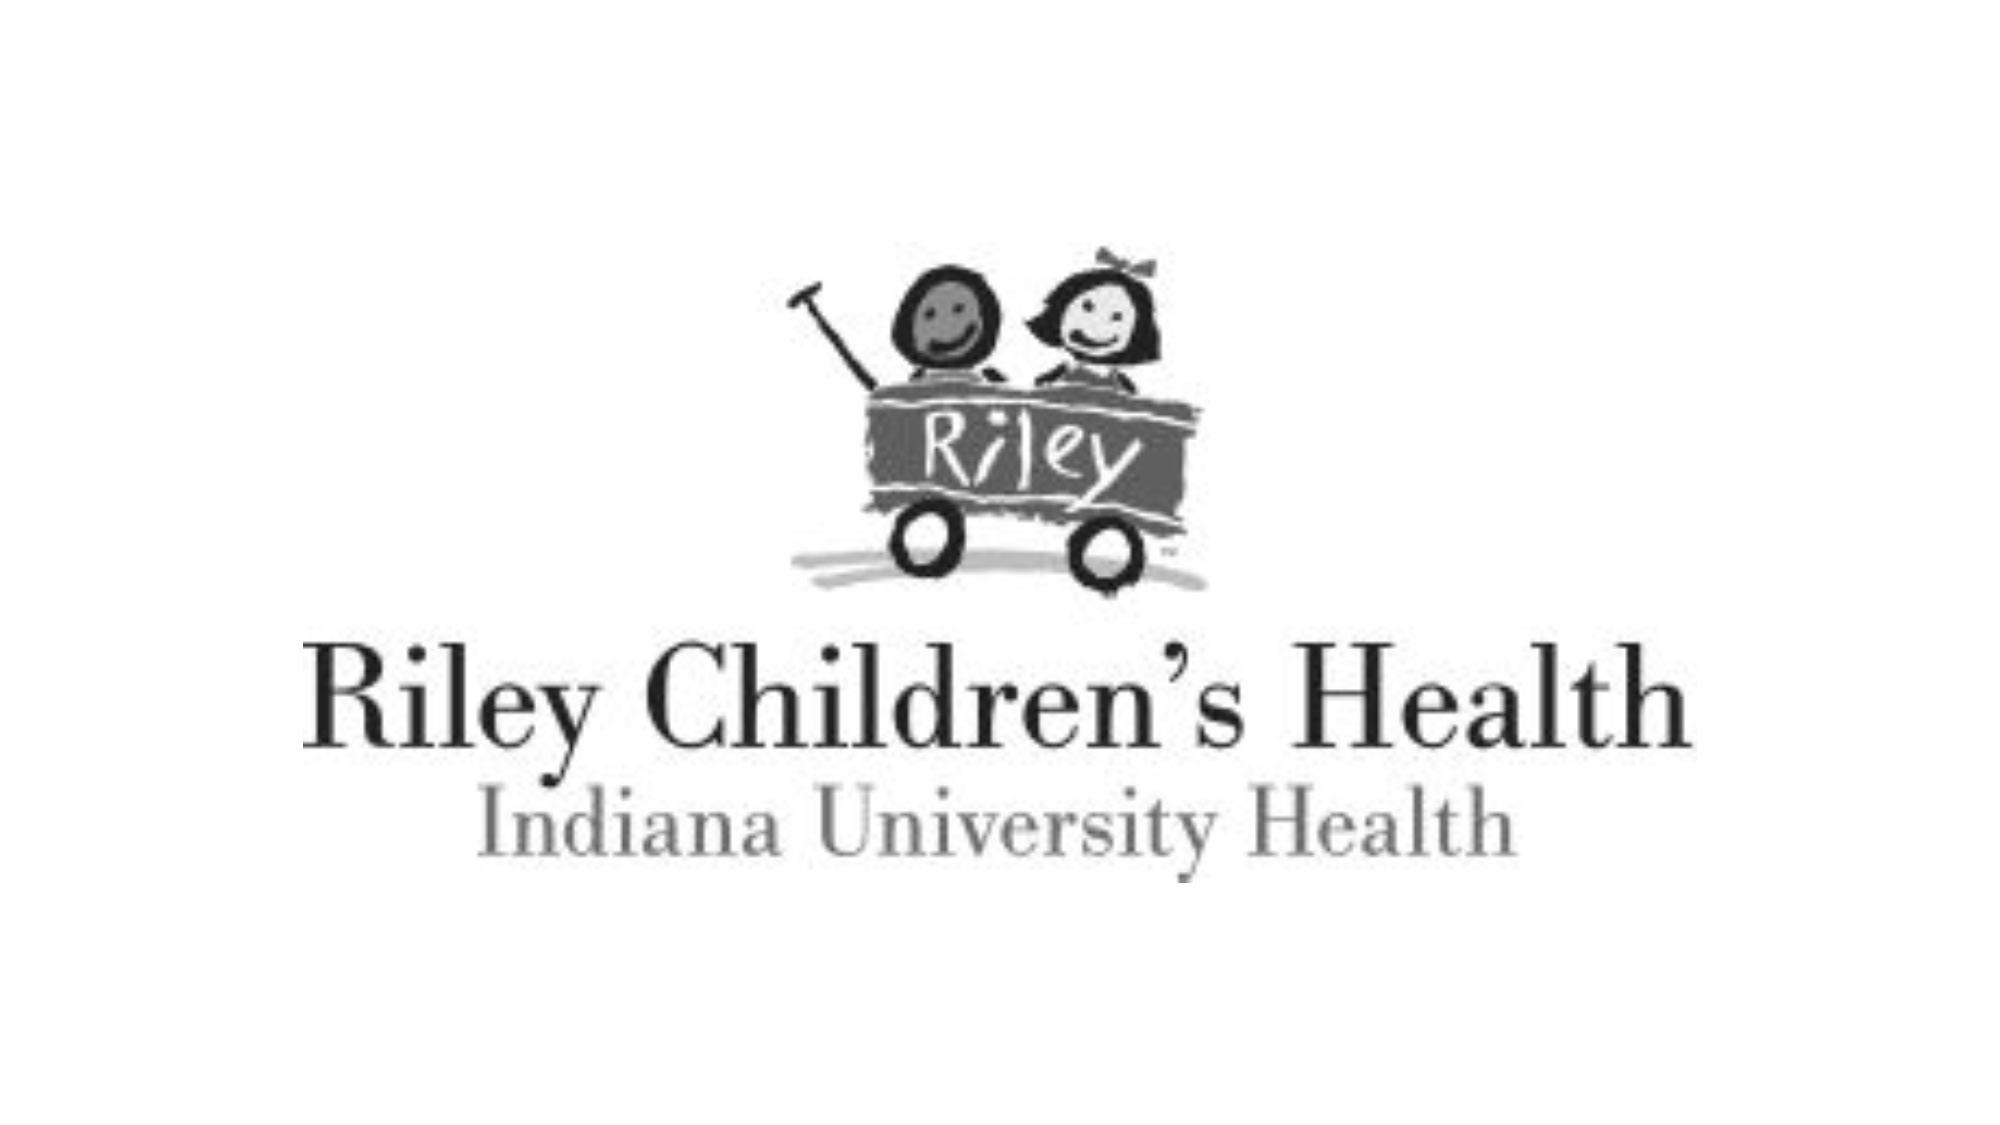 Riley Children's Health - Indiana University Health - logo